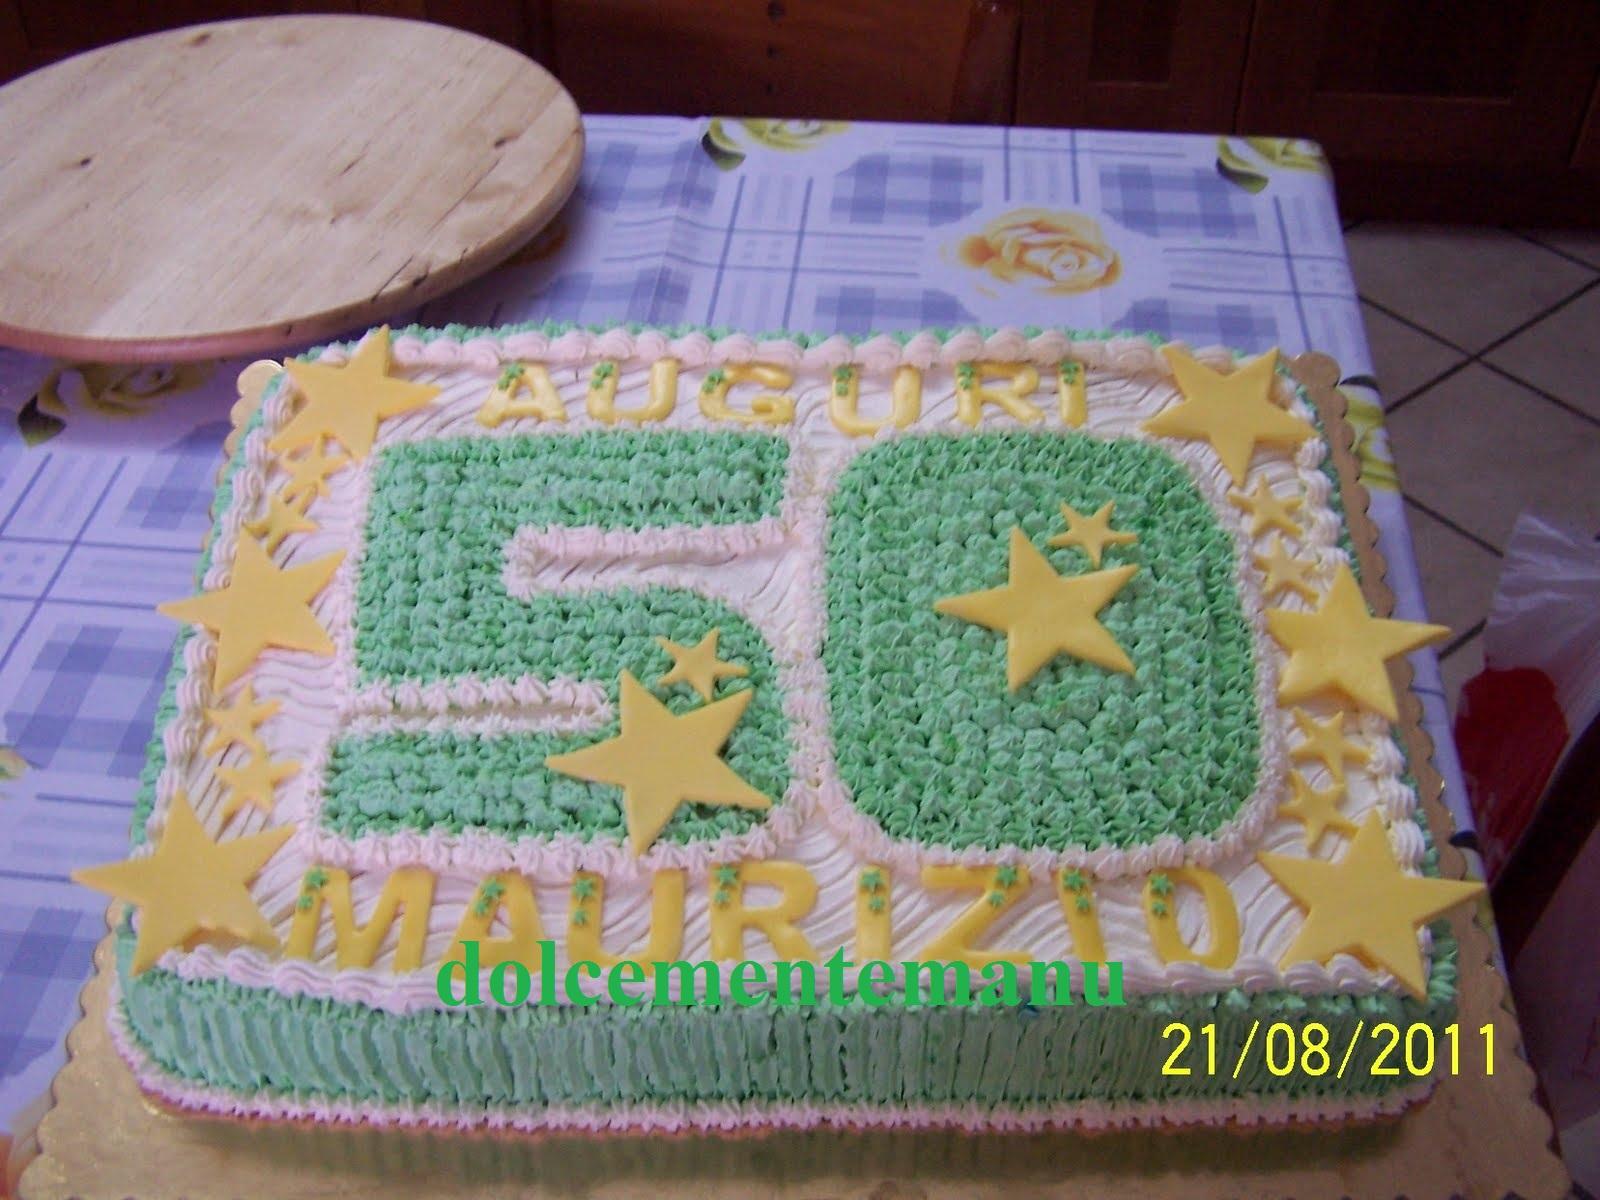 Célèbre dolcementemanu: torta x 50 anni !!! AN11